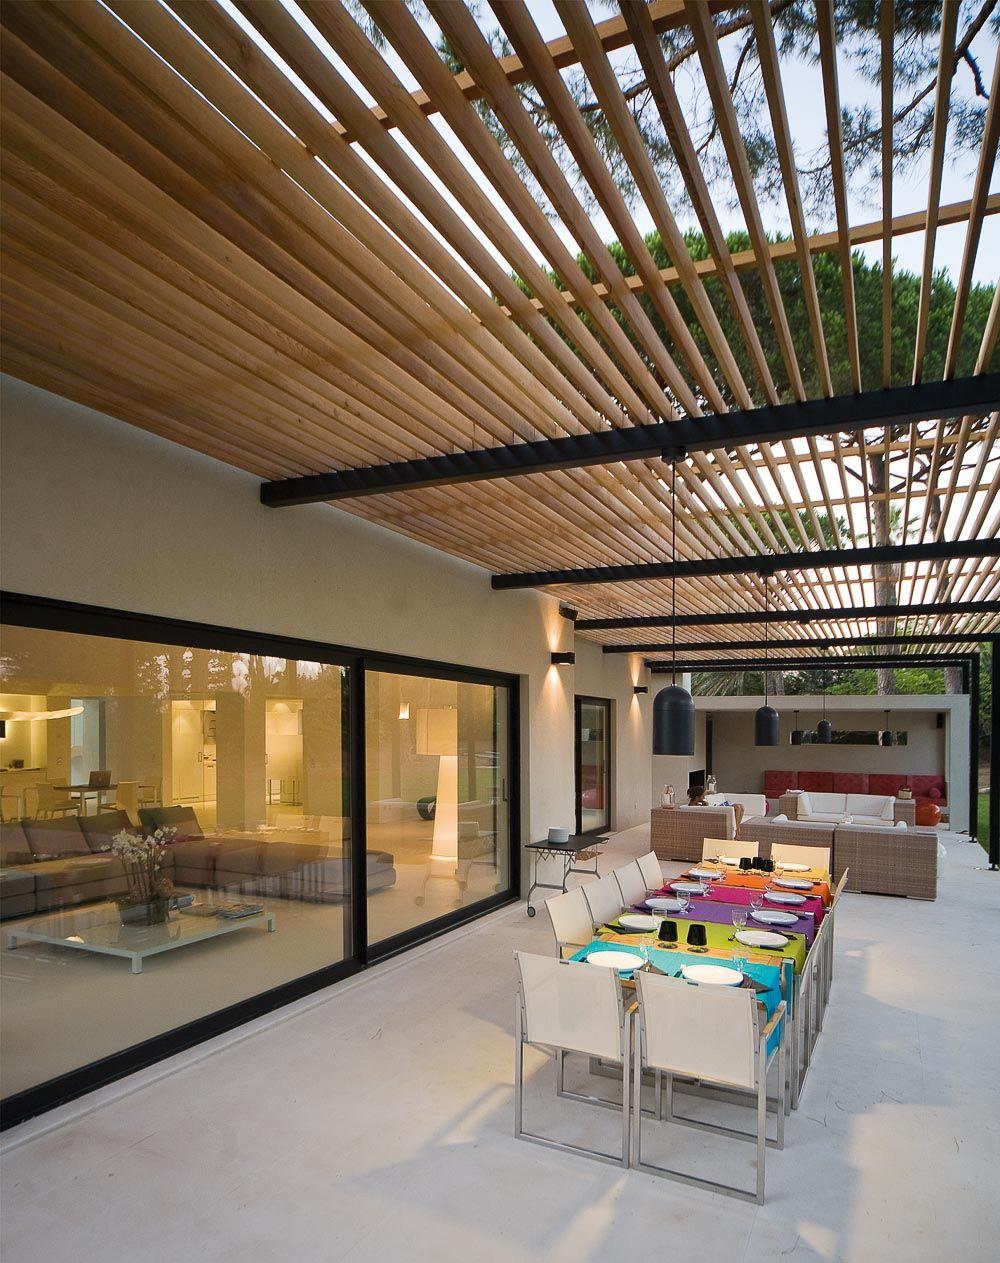 maison contemporaine saint tropez design interiors pinterest pergolas outdoor. Black Bedroom Furniture Sets. Home Design Ideas